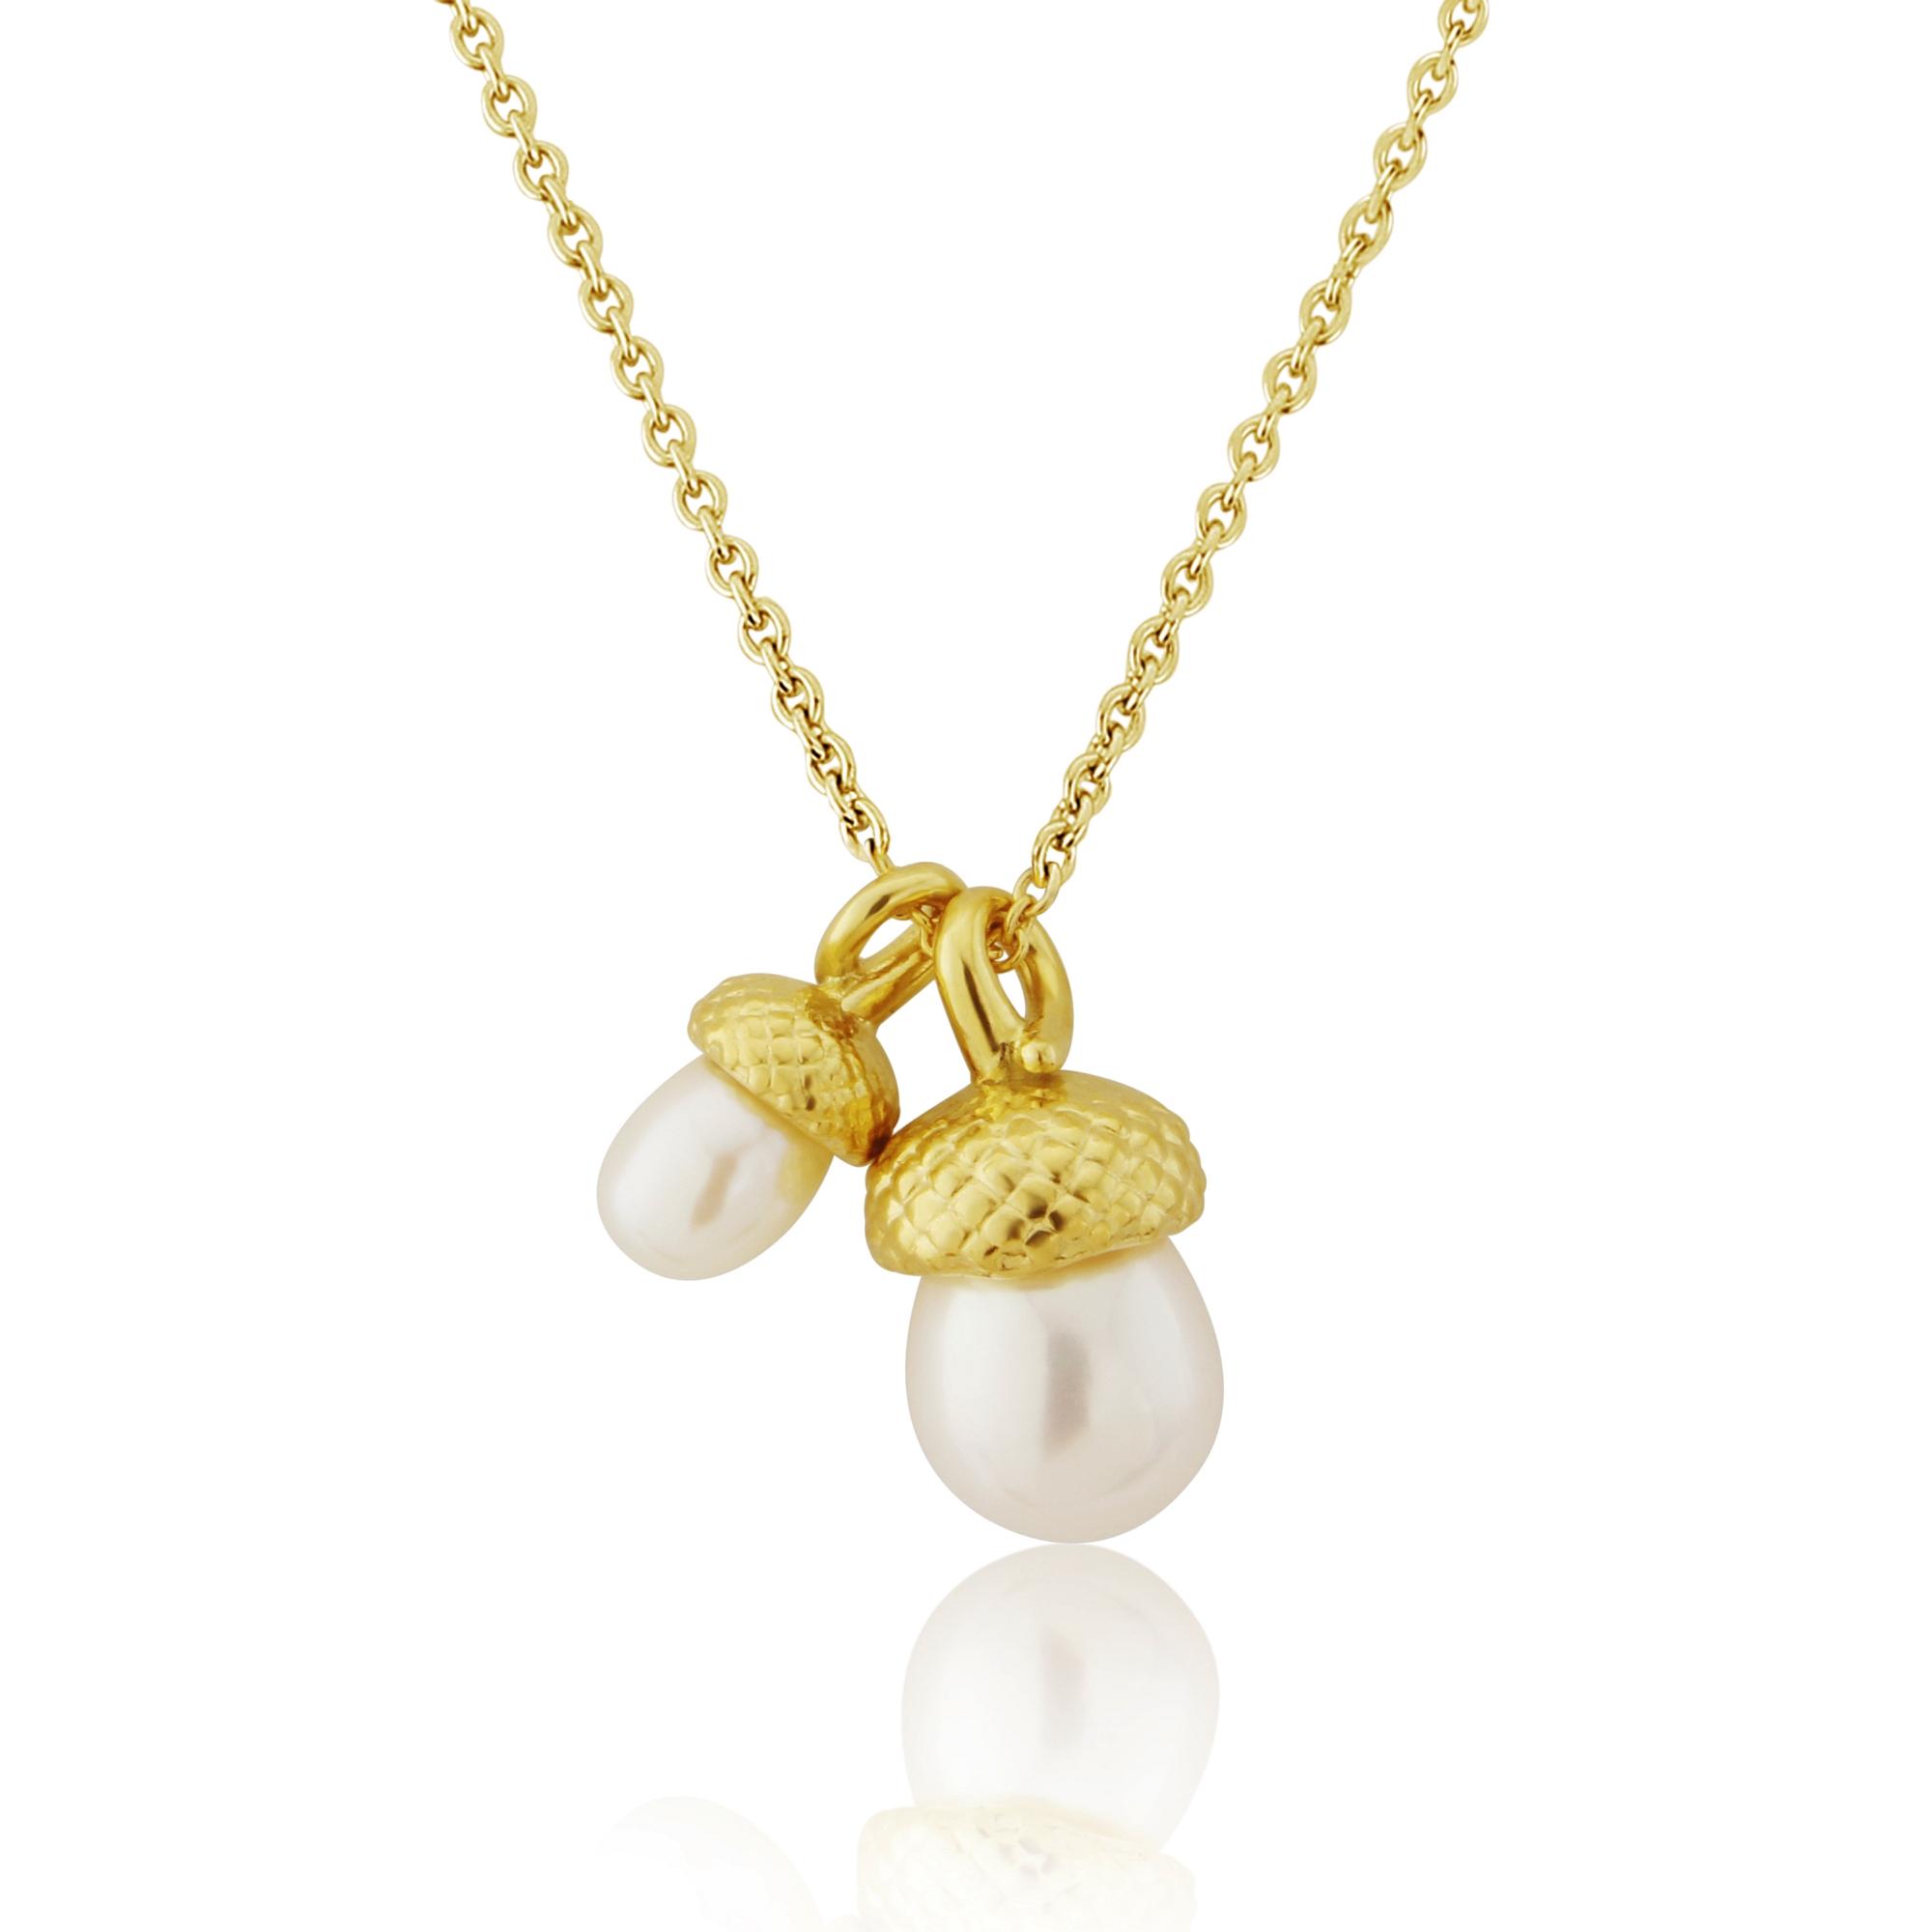 Gold vermeil double pearl acorn pendant artfull expression gold vermeil double pearl acorn pendant mozeypictures Image collections